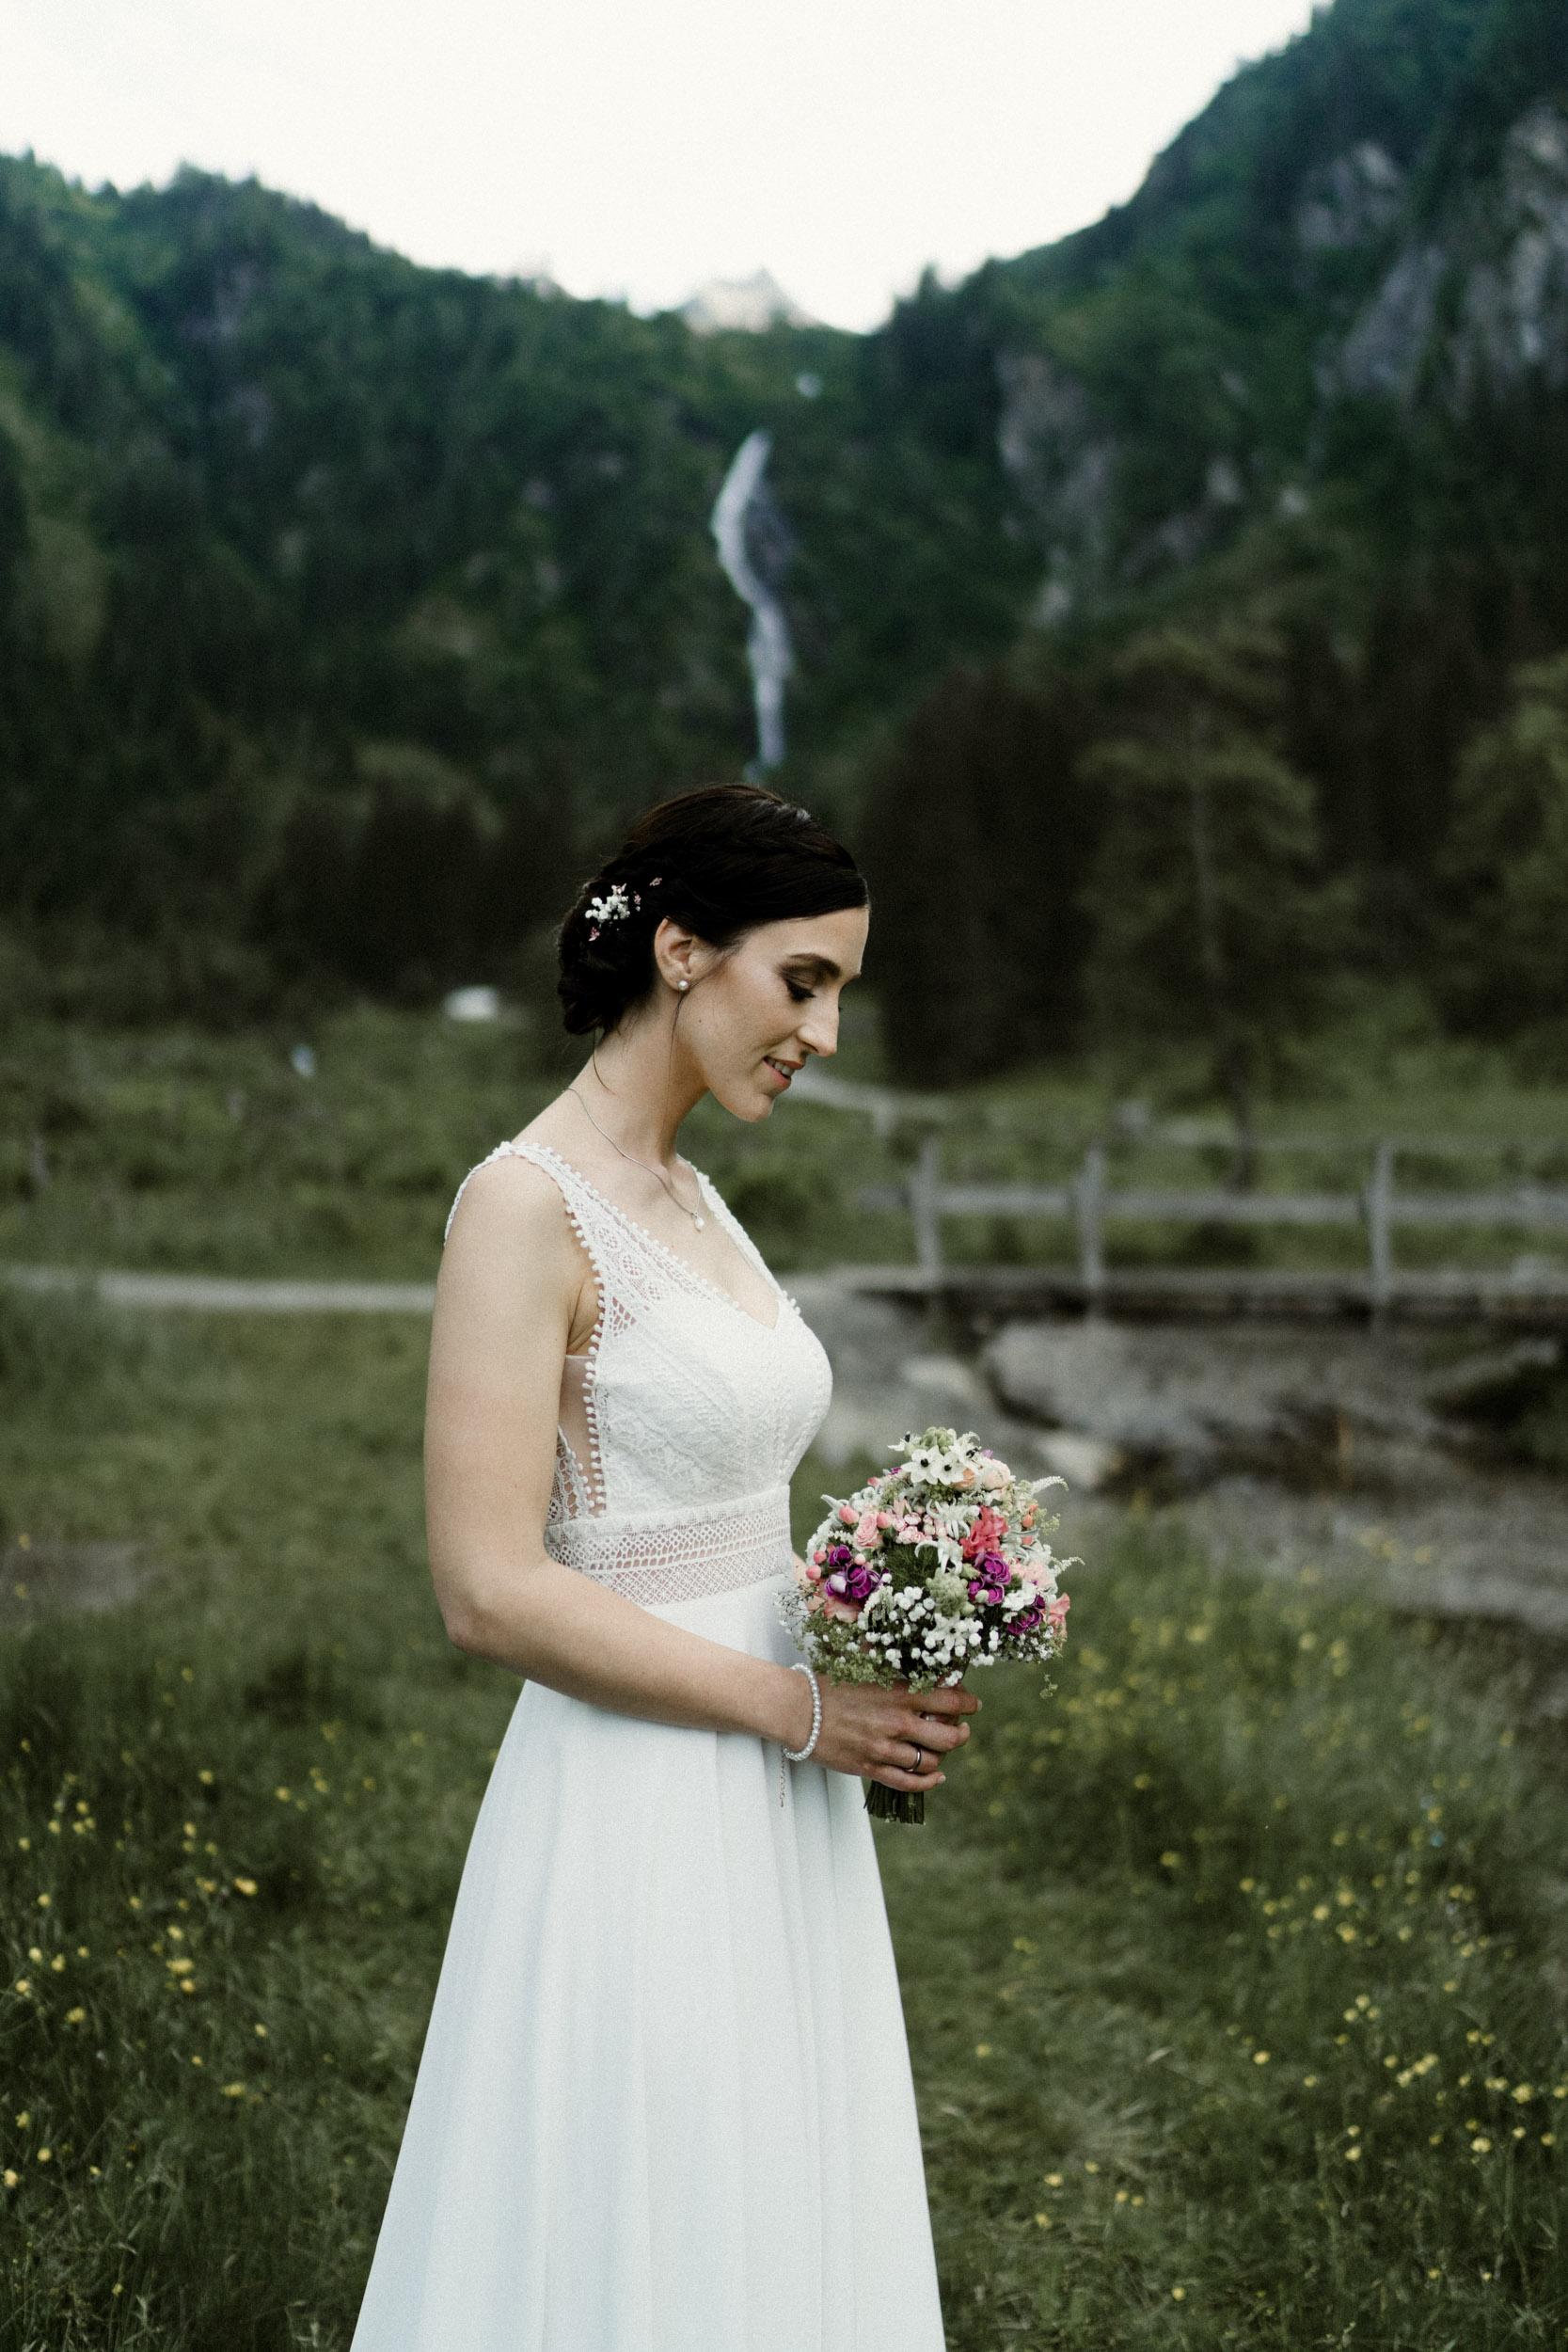 austria_mountain_wedding_photography_countryside_vienna-46.jpg